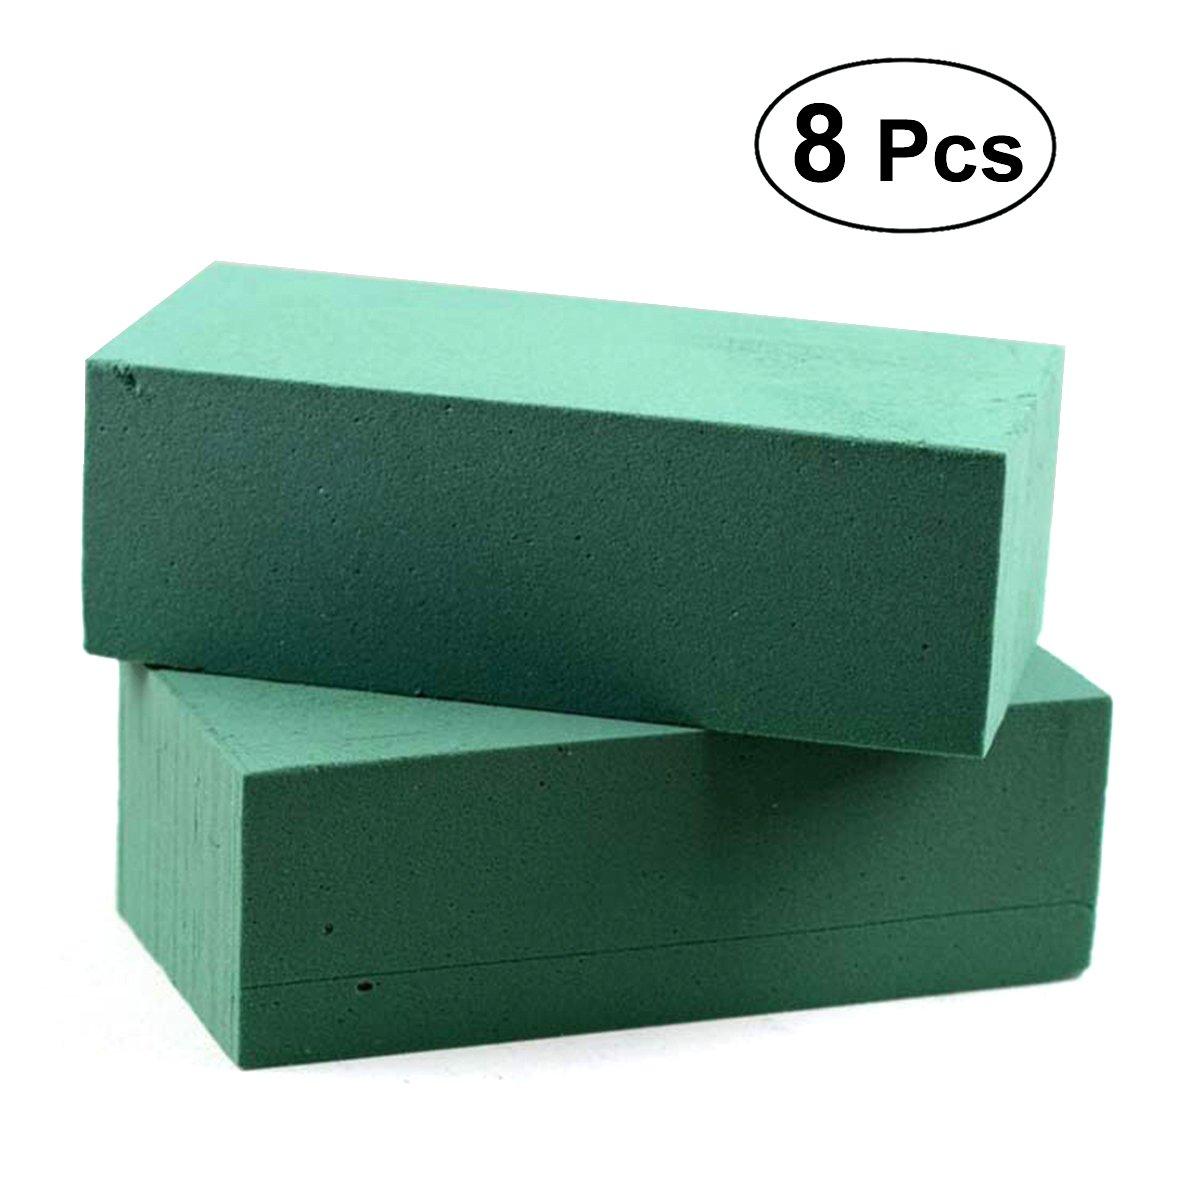 ULTNICE 8Pcs Floral Foam Bricks Green Styrofoam Blocks for Packaging Artificial Flowers Plants